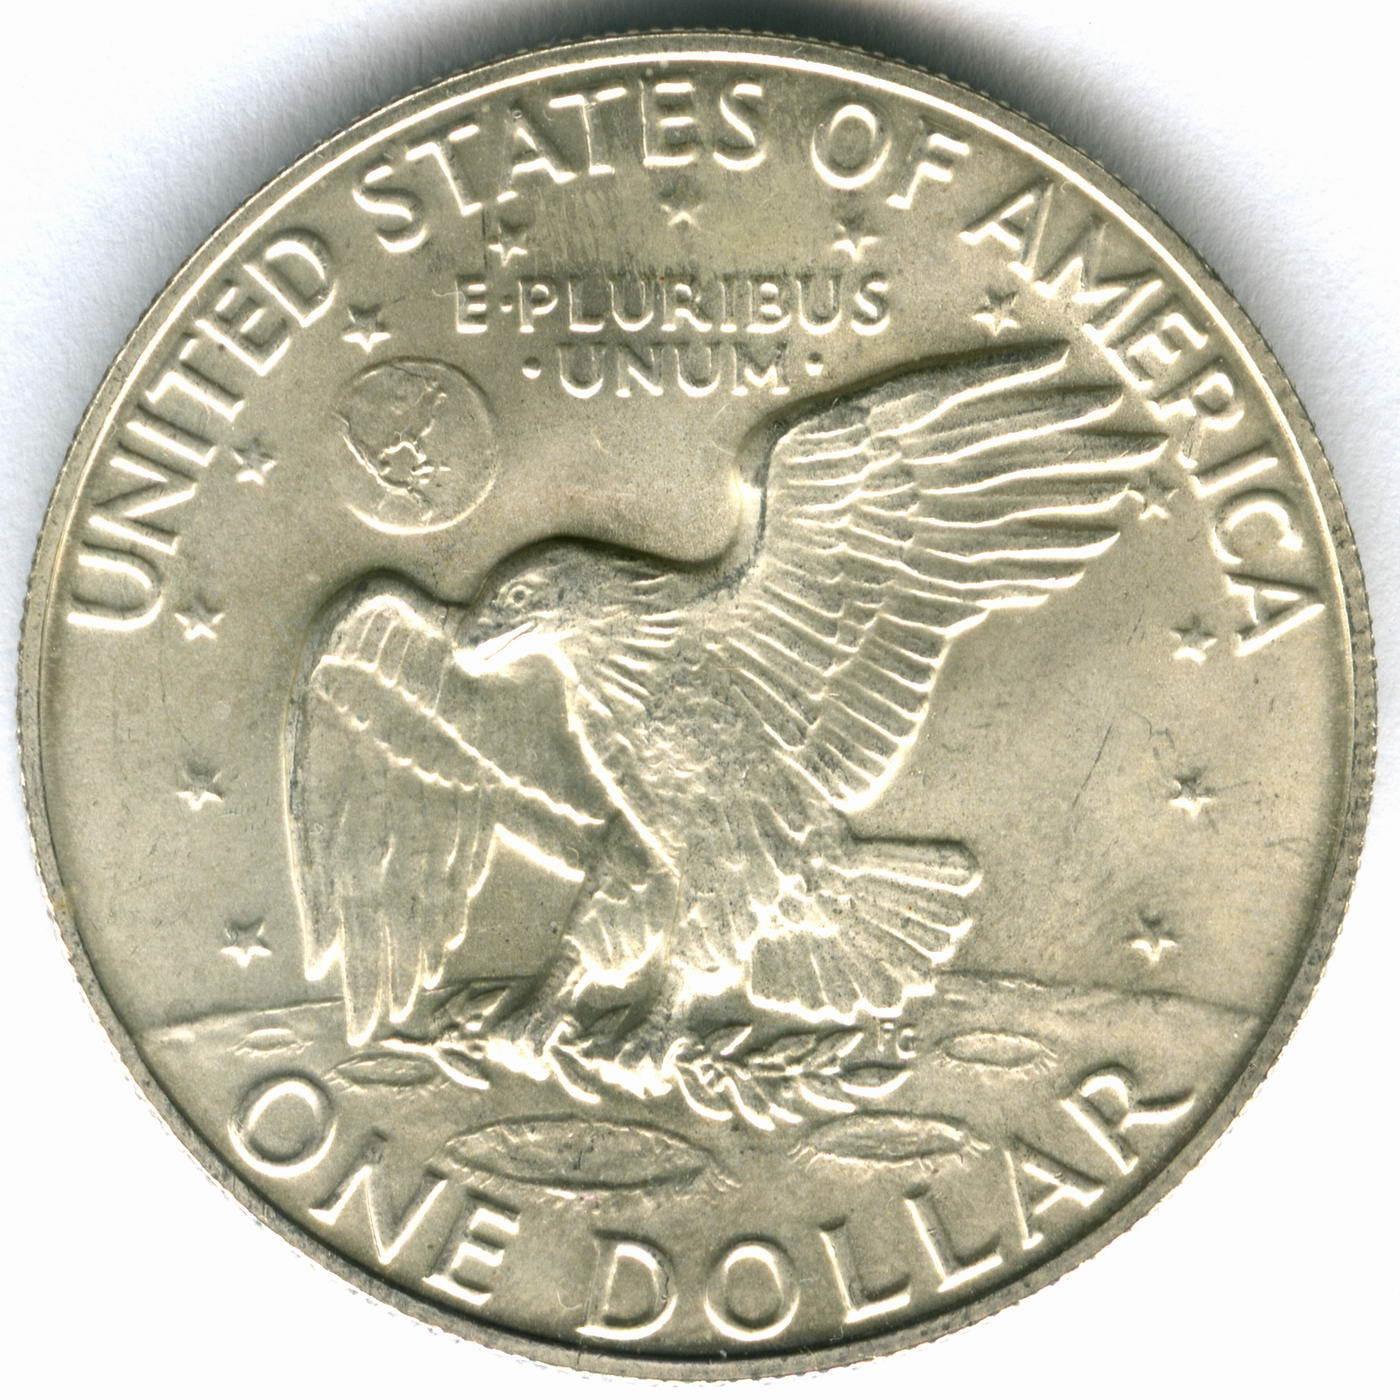 1 доллар 1973 год. (S) США Эйзенхауэр (лунный) AU